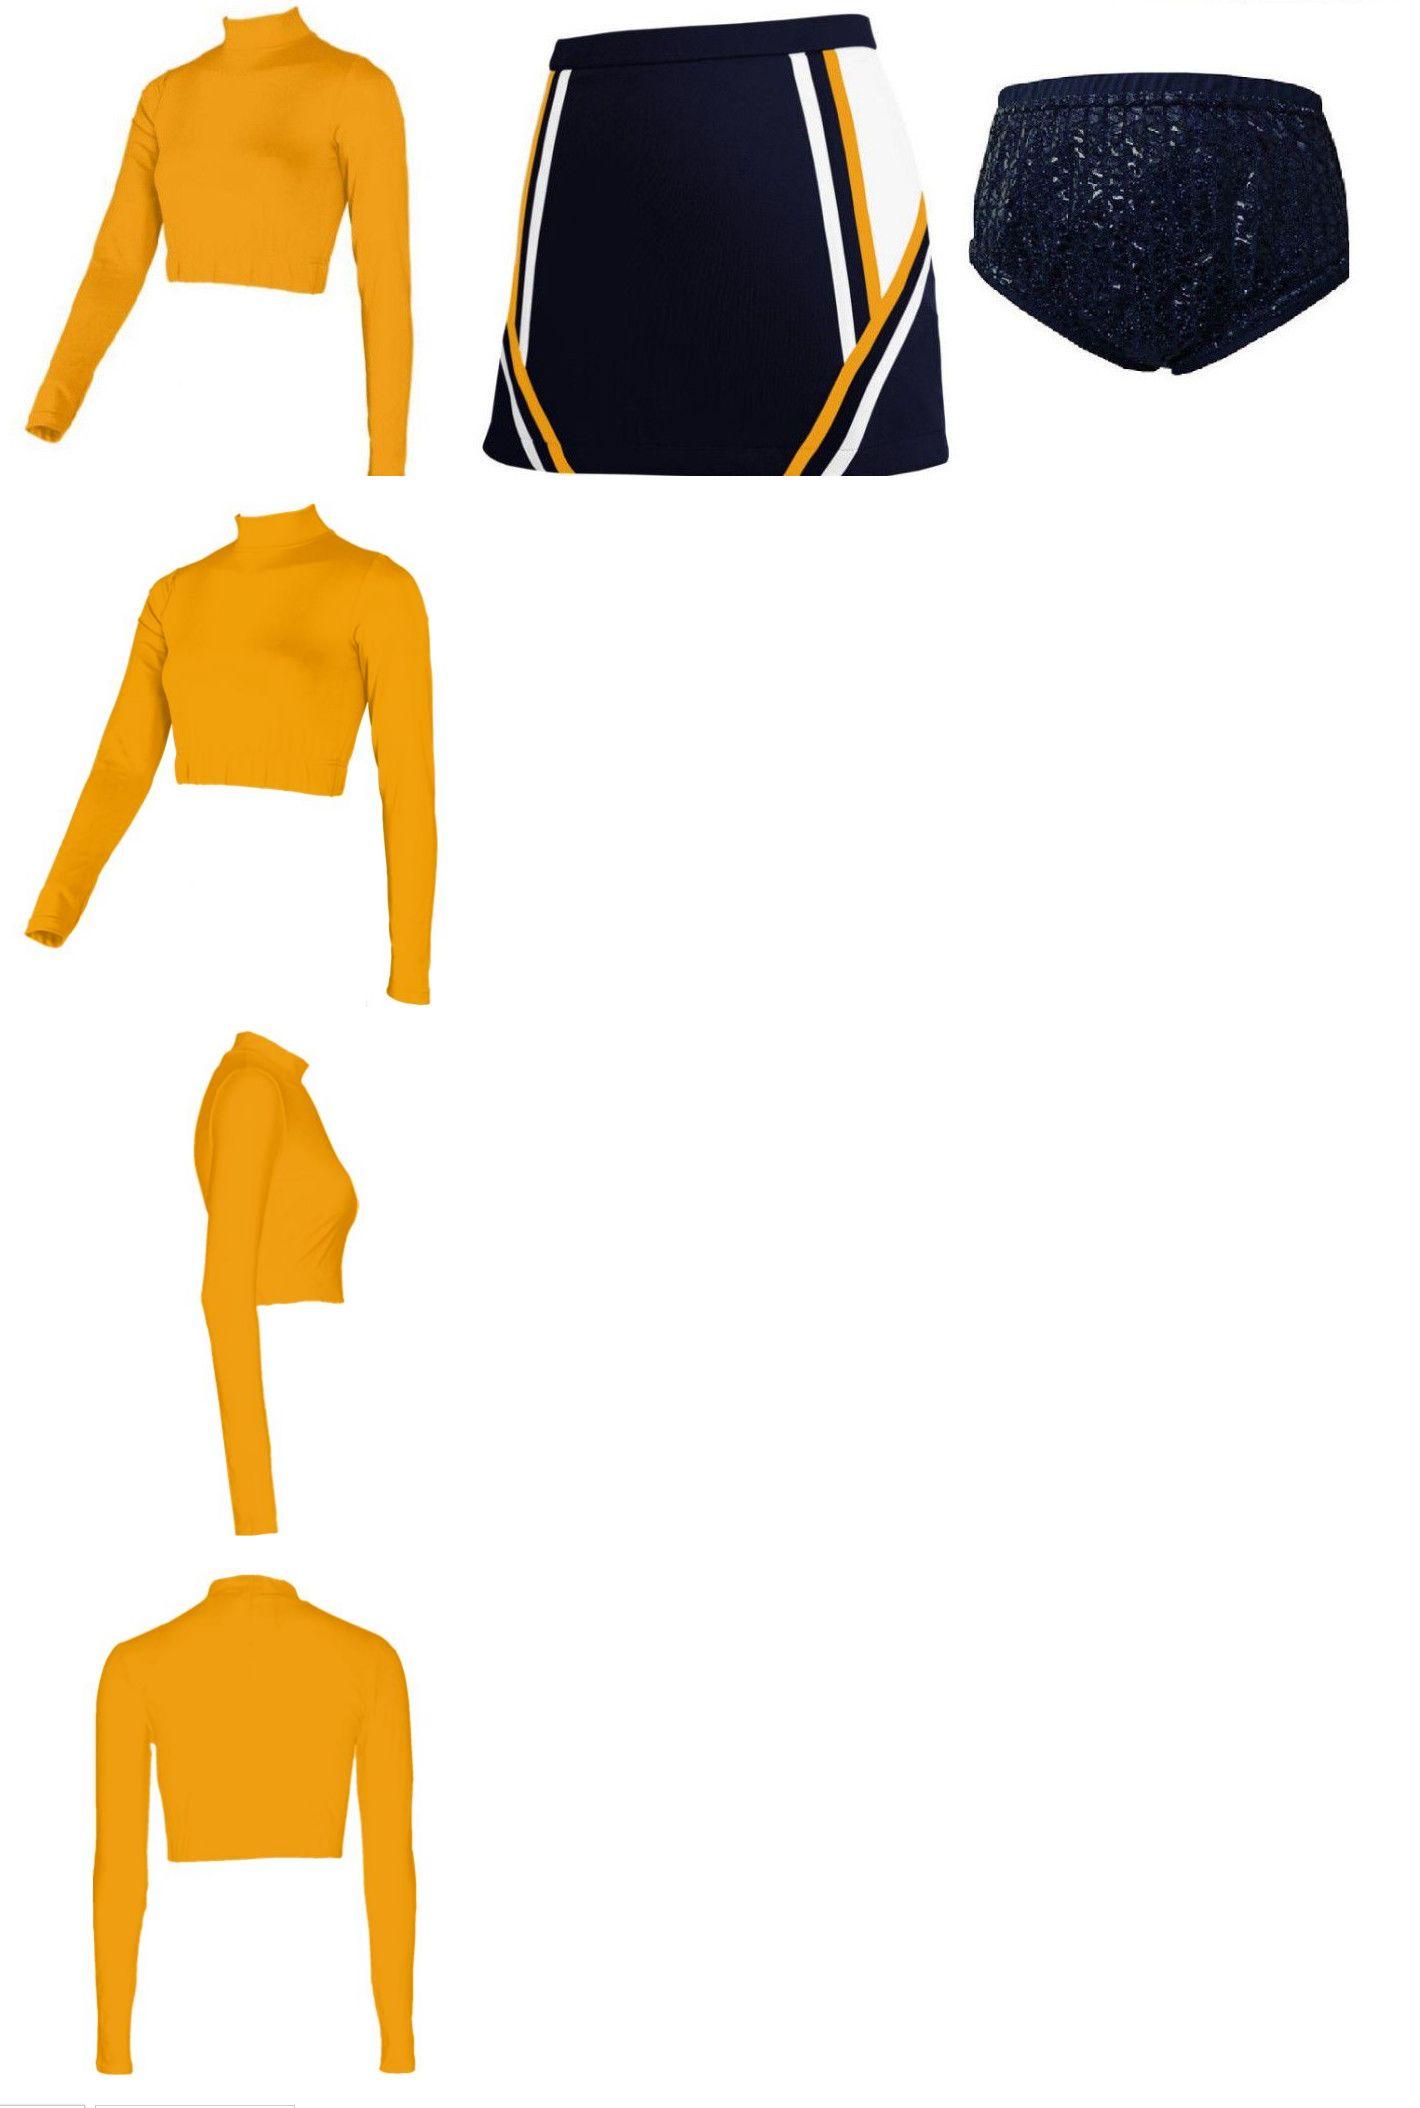 af36cc24d83 Cheerleading 66832  Adult Xl 14 16 Real Cheerleader Uniform Top Skirt  Sequin Briefs 41-43 33-35 New -  BUY IT NOW ONLY   44.99 on  eBay    cheerleading ...